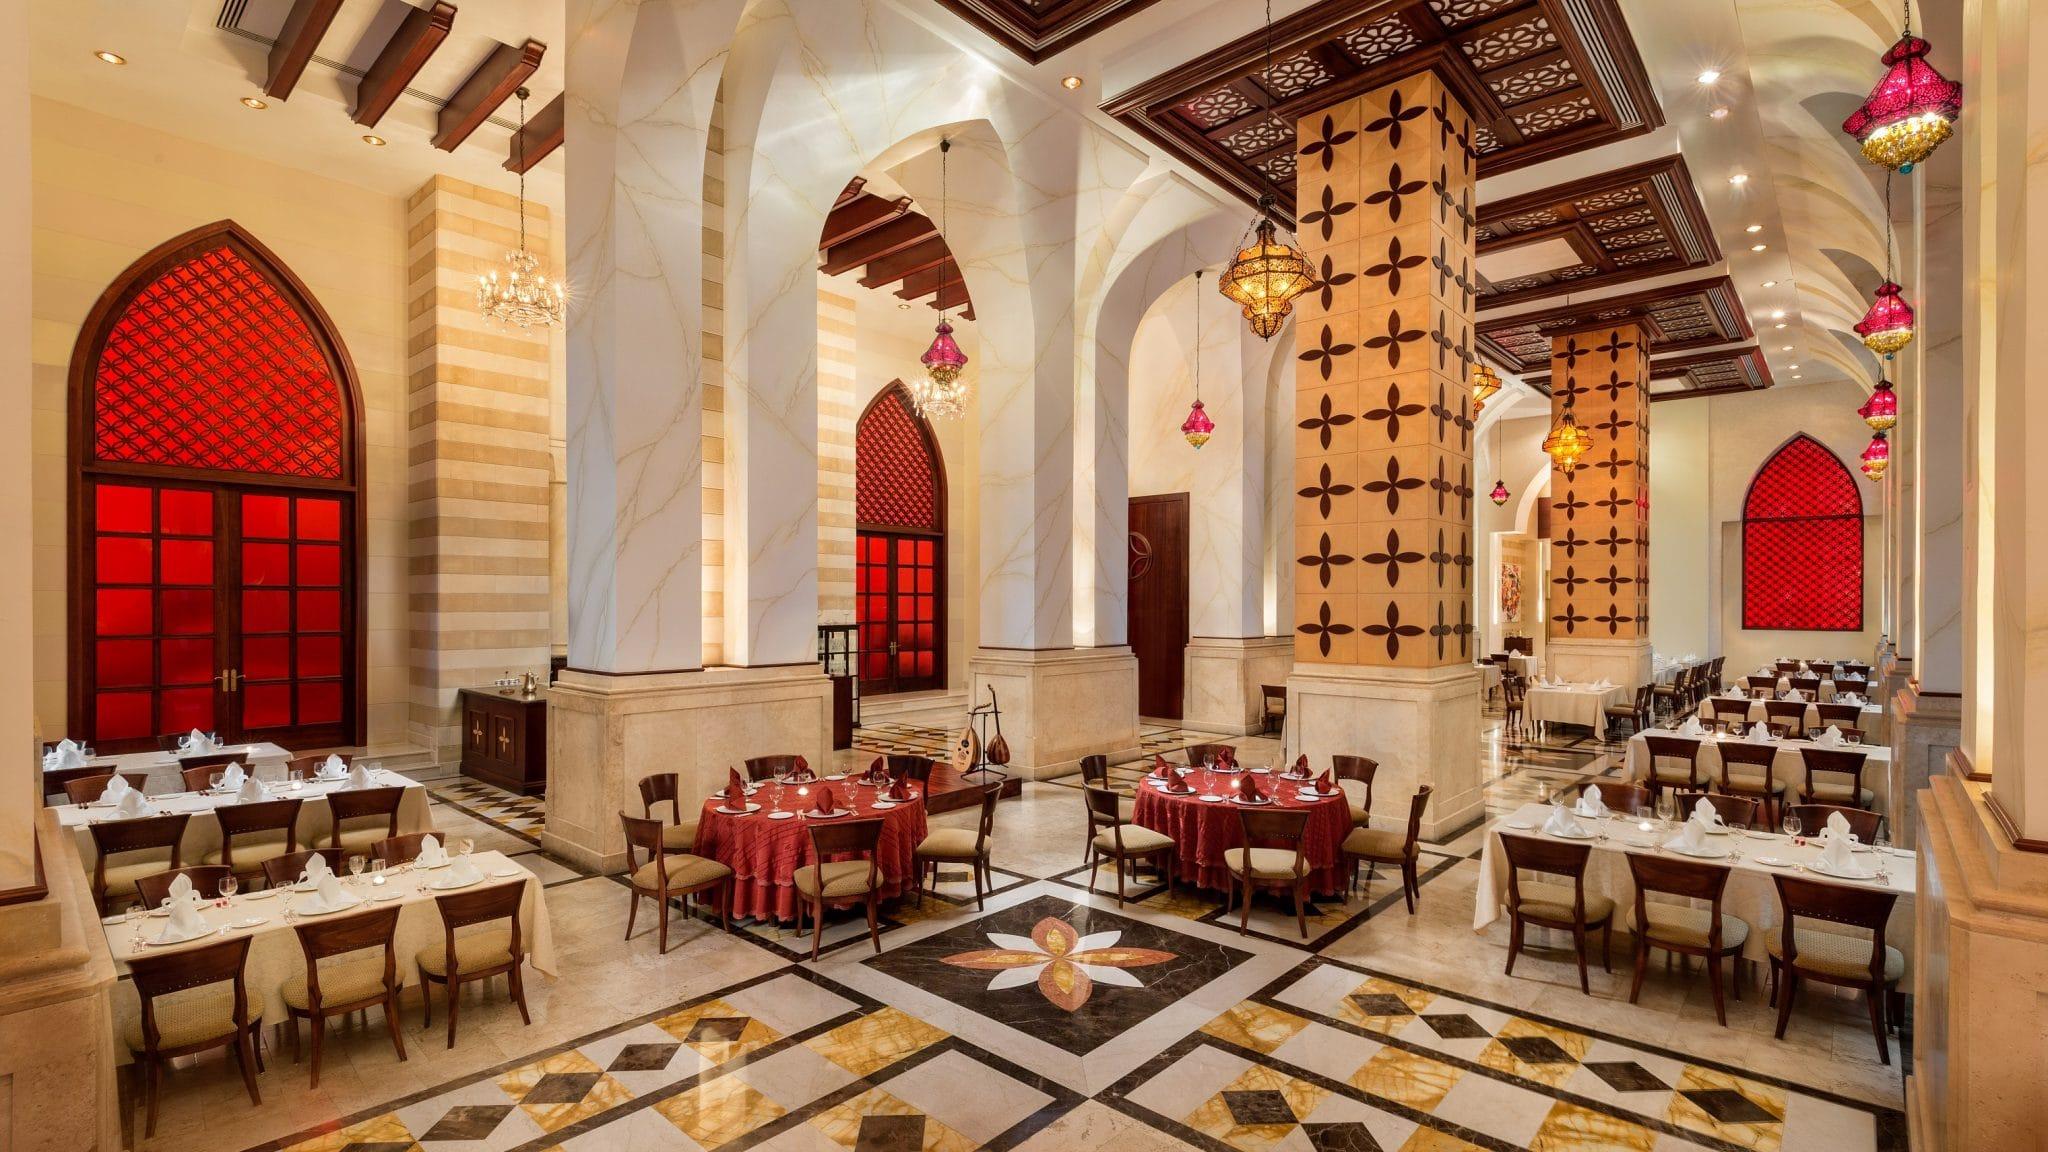 مطعم موال اللبناني